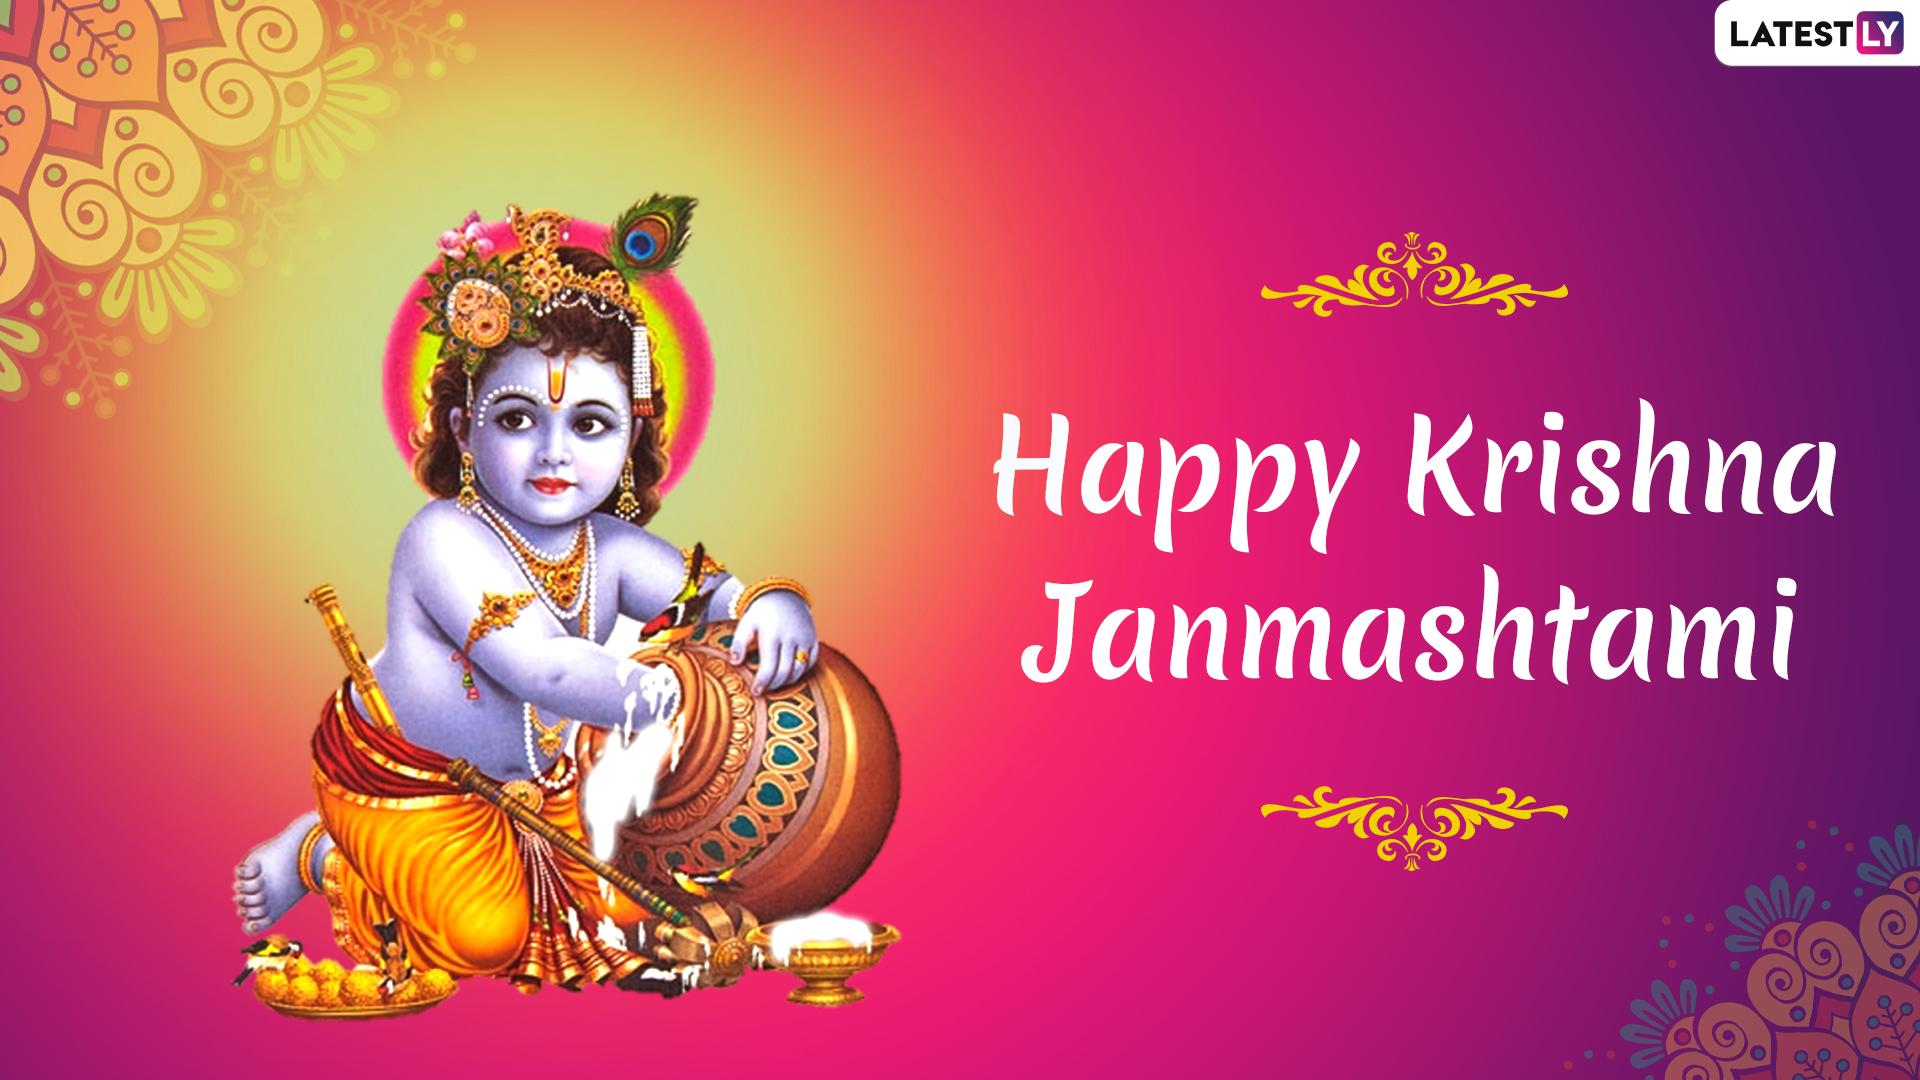 Janmashtami Images & Lord Krishna HD Wallpapers for Free